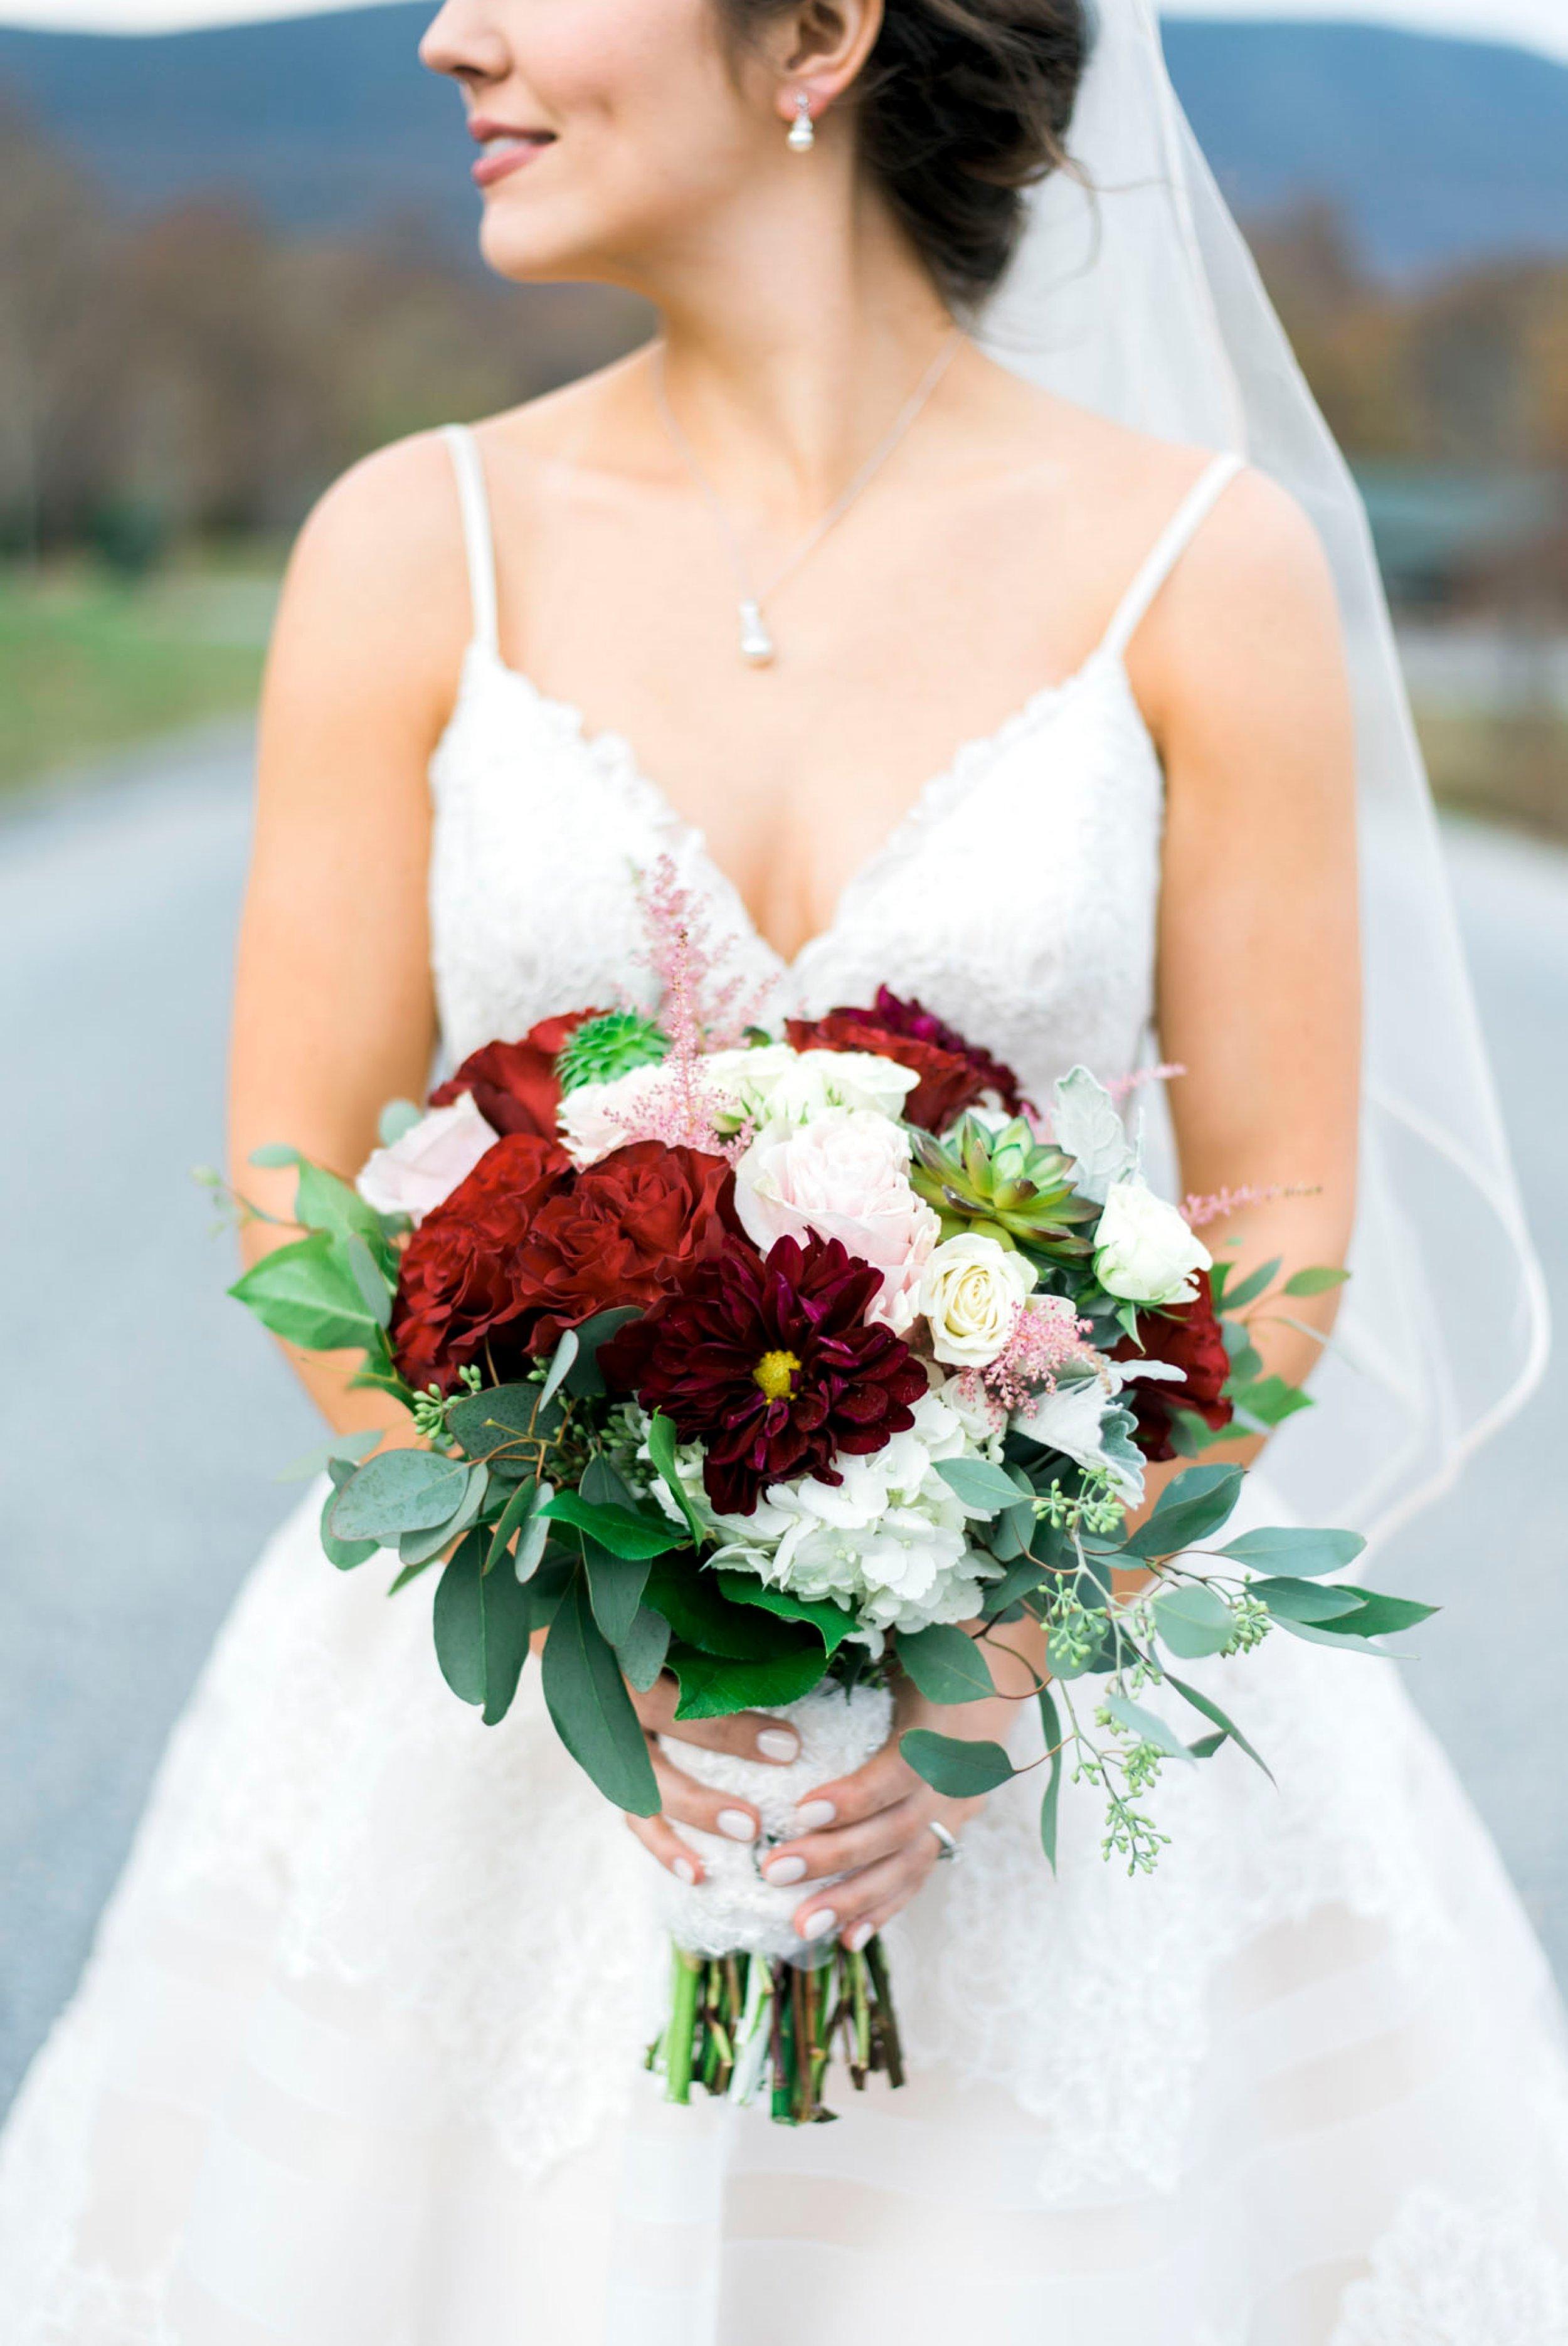 IrvineEstate_LexingtonVA_Wedding_FallWedding_VirginiaWeddingPhotographer 49.jpg